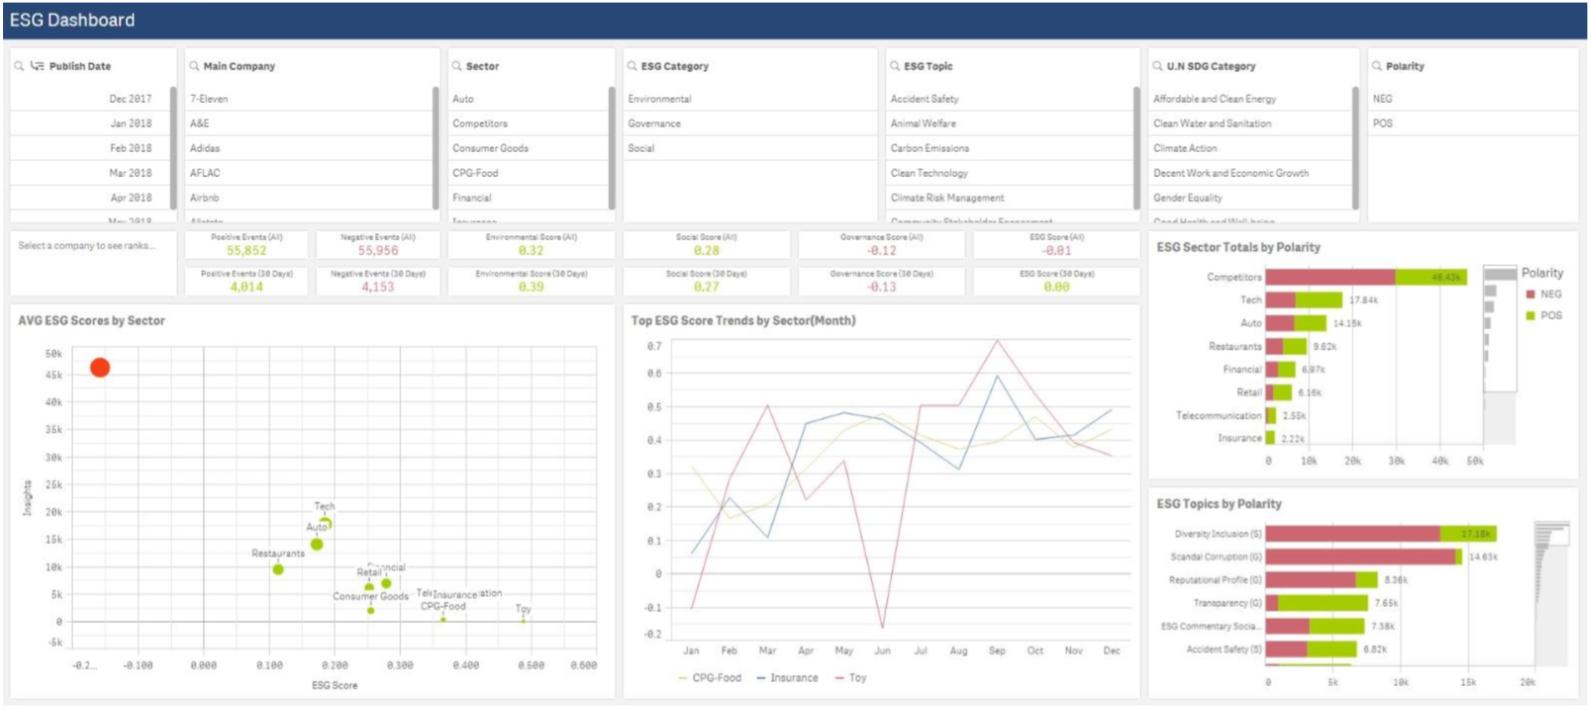 Amenity Analytics' ESG Model Analyzes Nike's Kaepernick Campaign